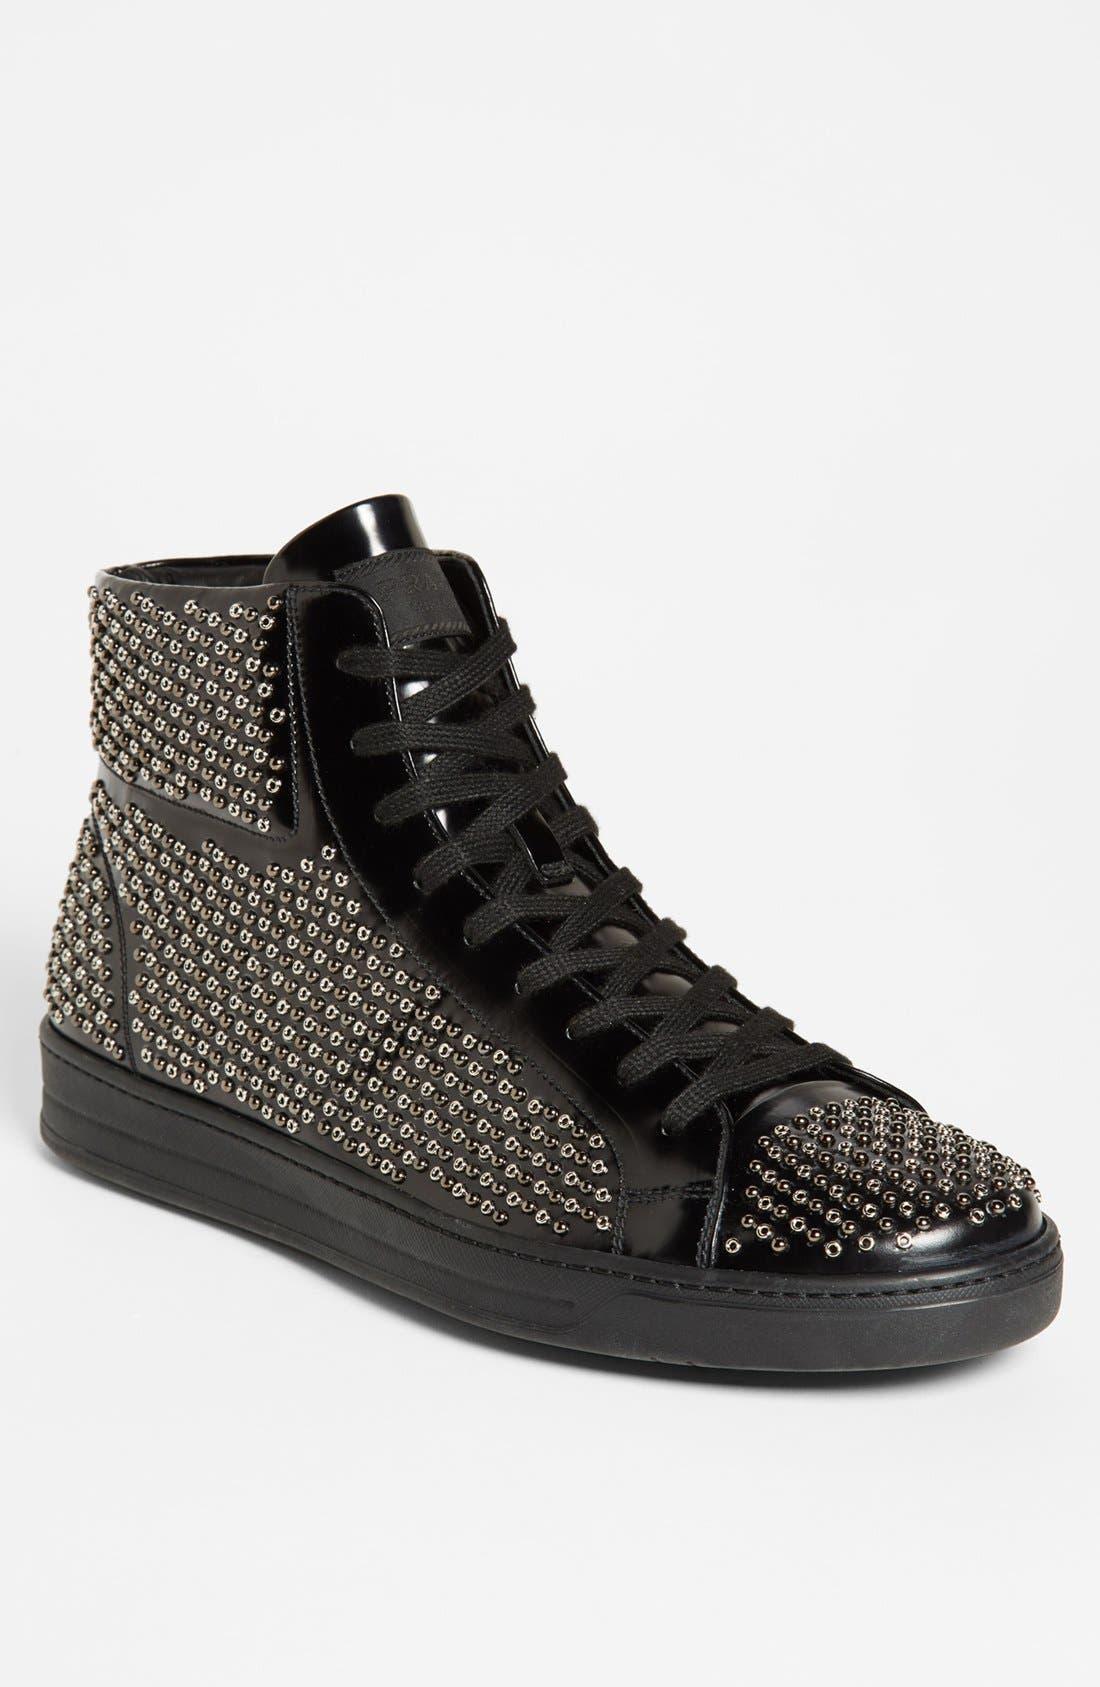 Alternate Image 1 Selected - Prada Studded Sneaker